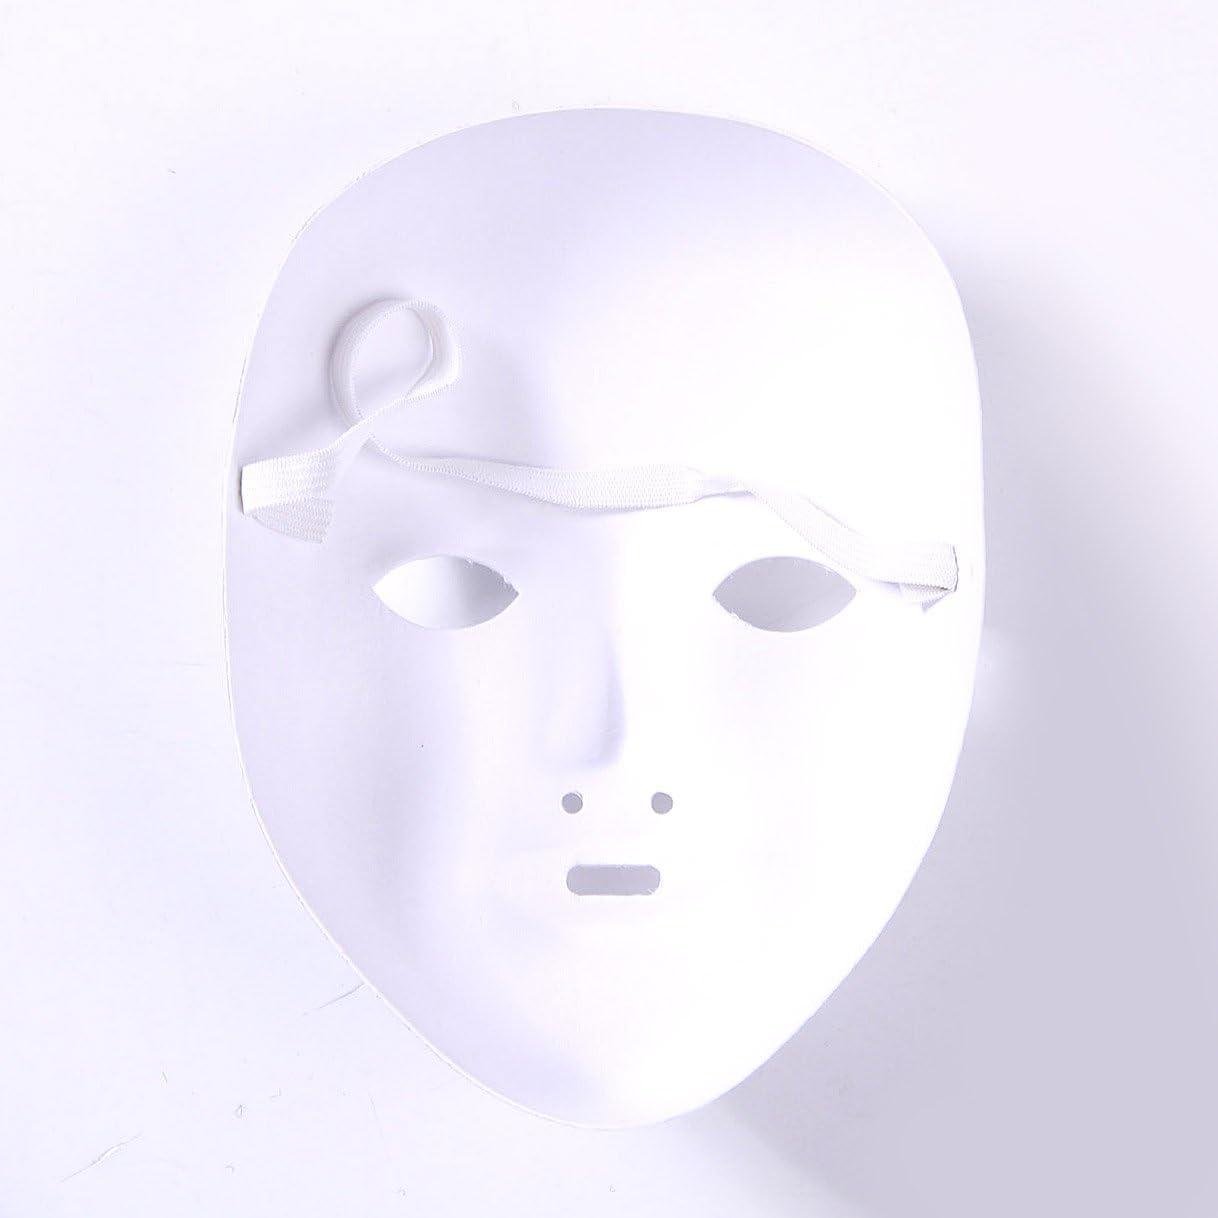 Tinksky Masque Complet de No/ël Masque de Peinture Bricolage 6pcs Costume de No/ël Masque Blanc Vierge de p/âte pour la Peinture de Bricolage 6pcs